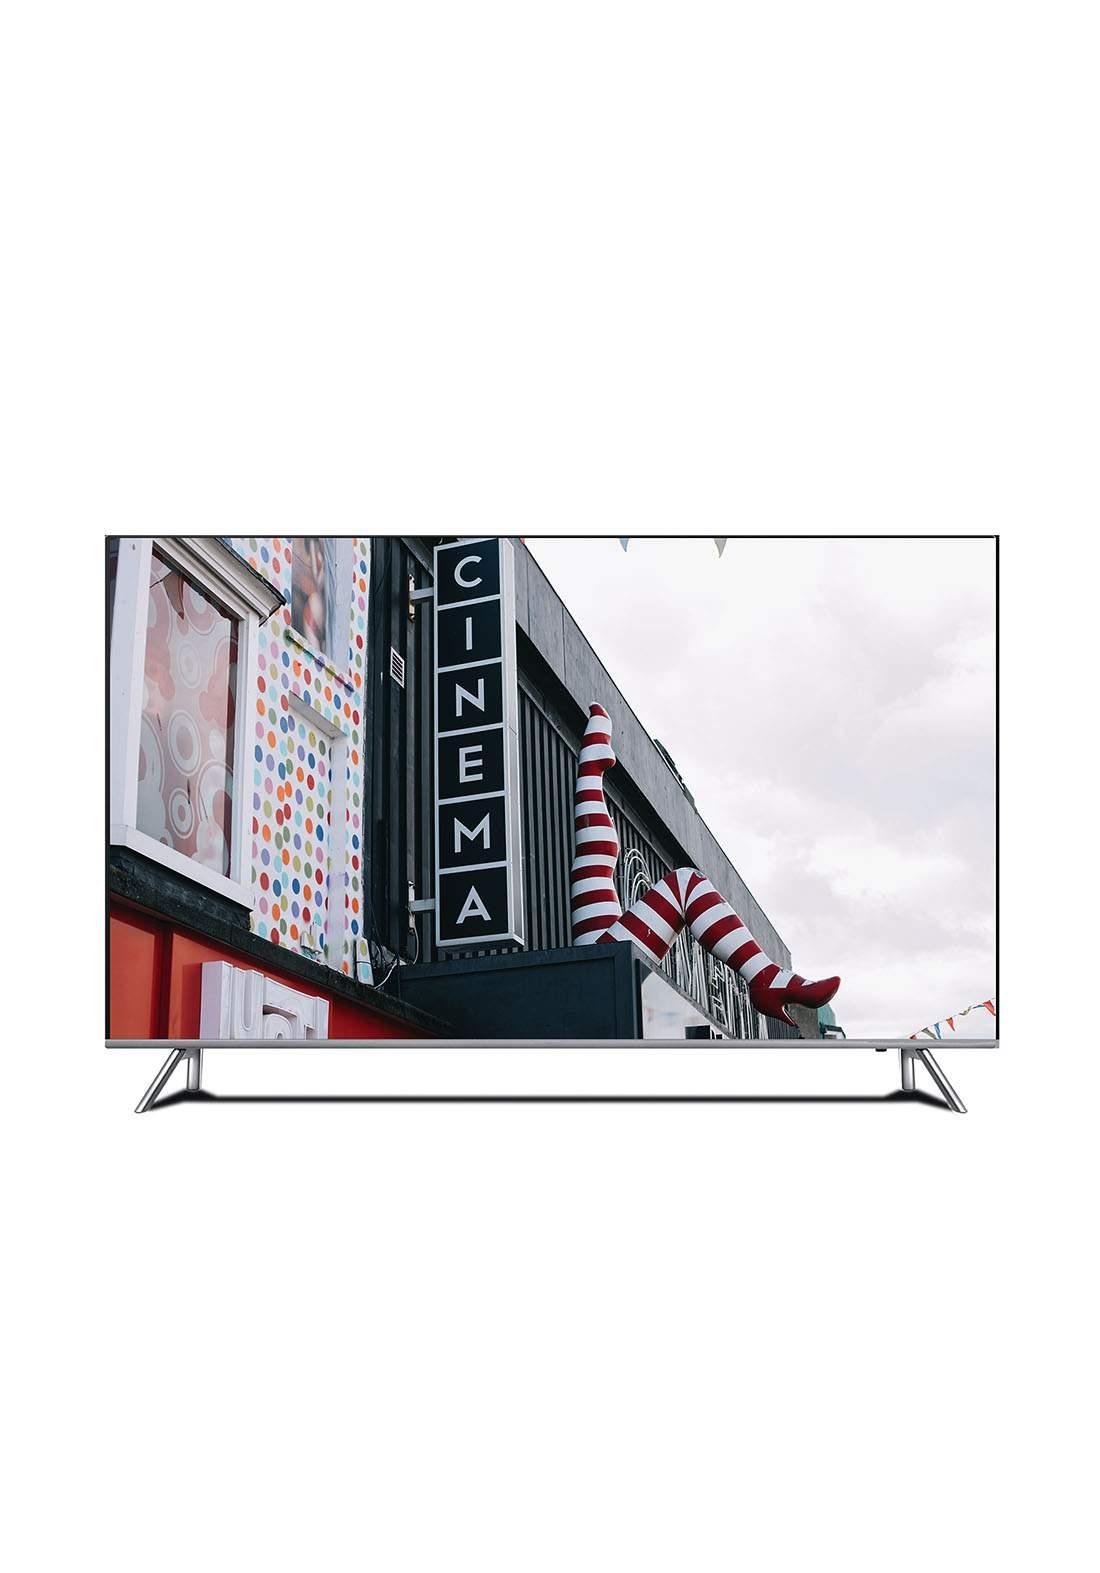 Shark Smart With Voice Command Led Tv - 50inch 4K شاشة ذكية ناطقة